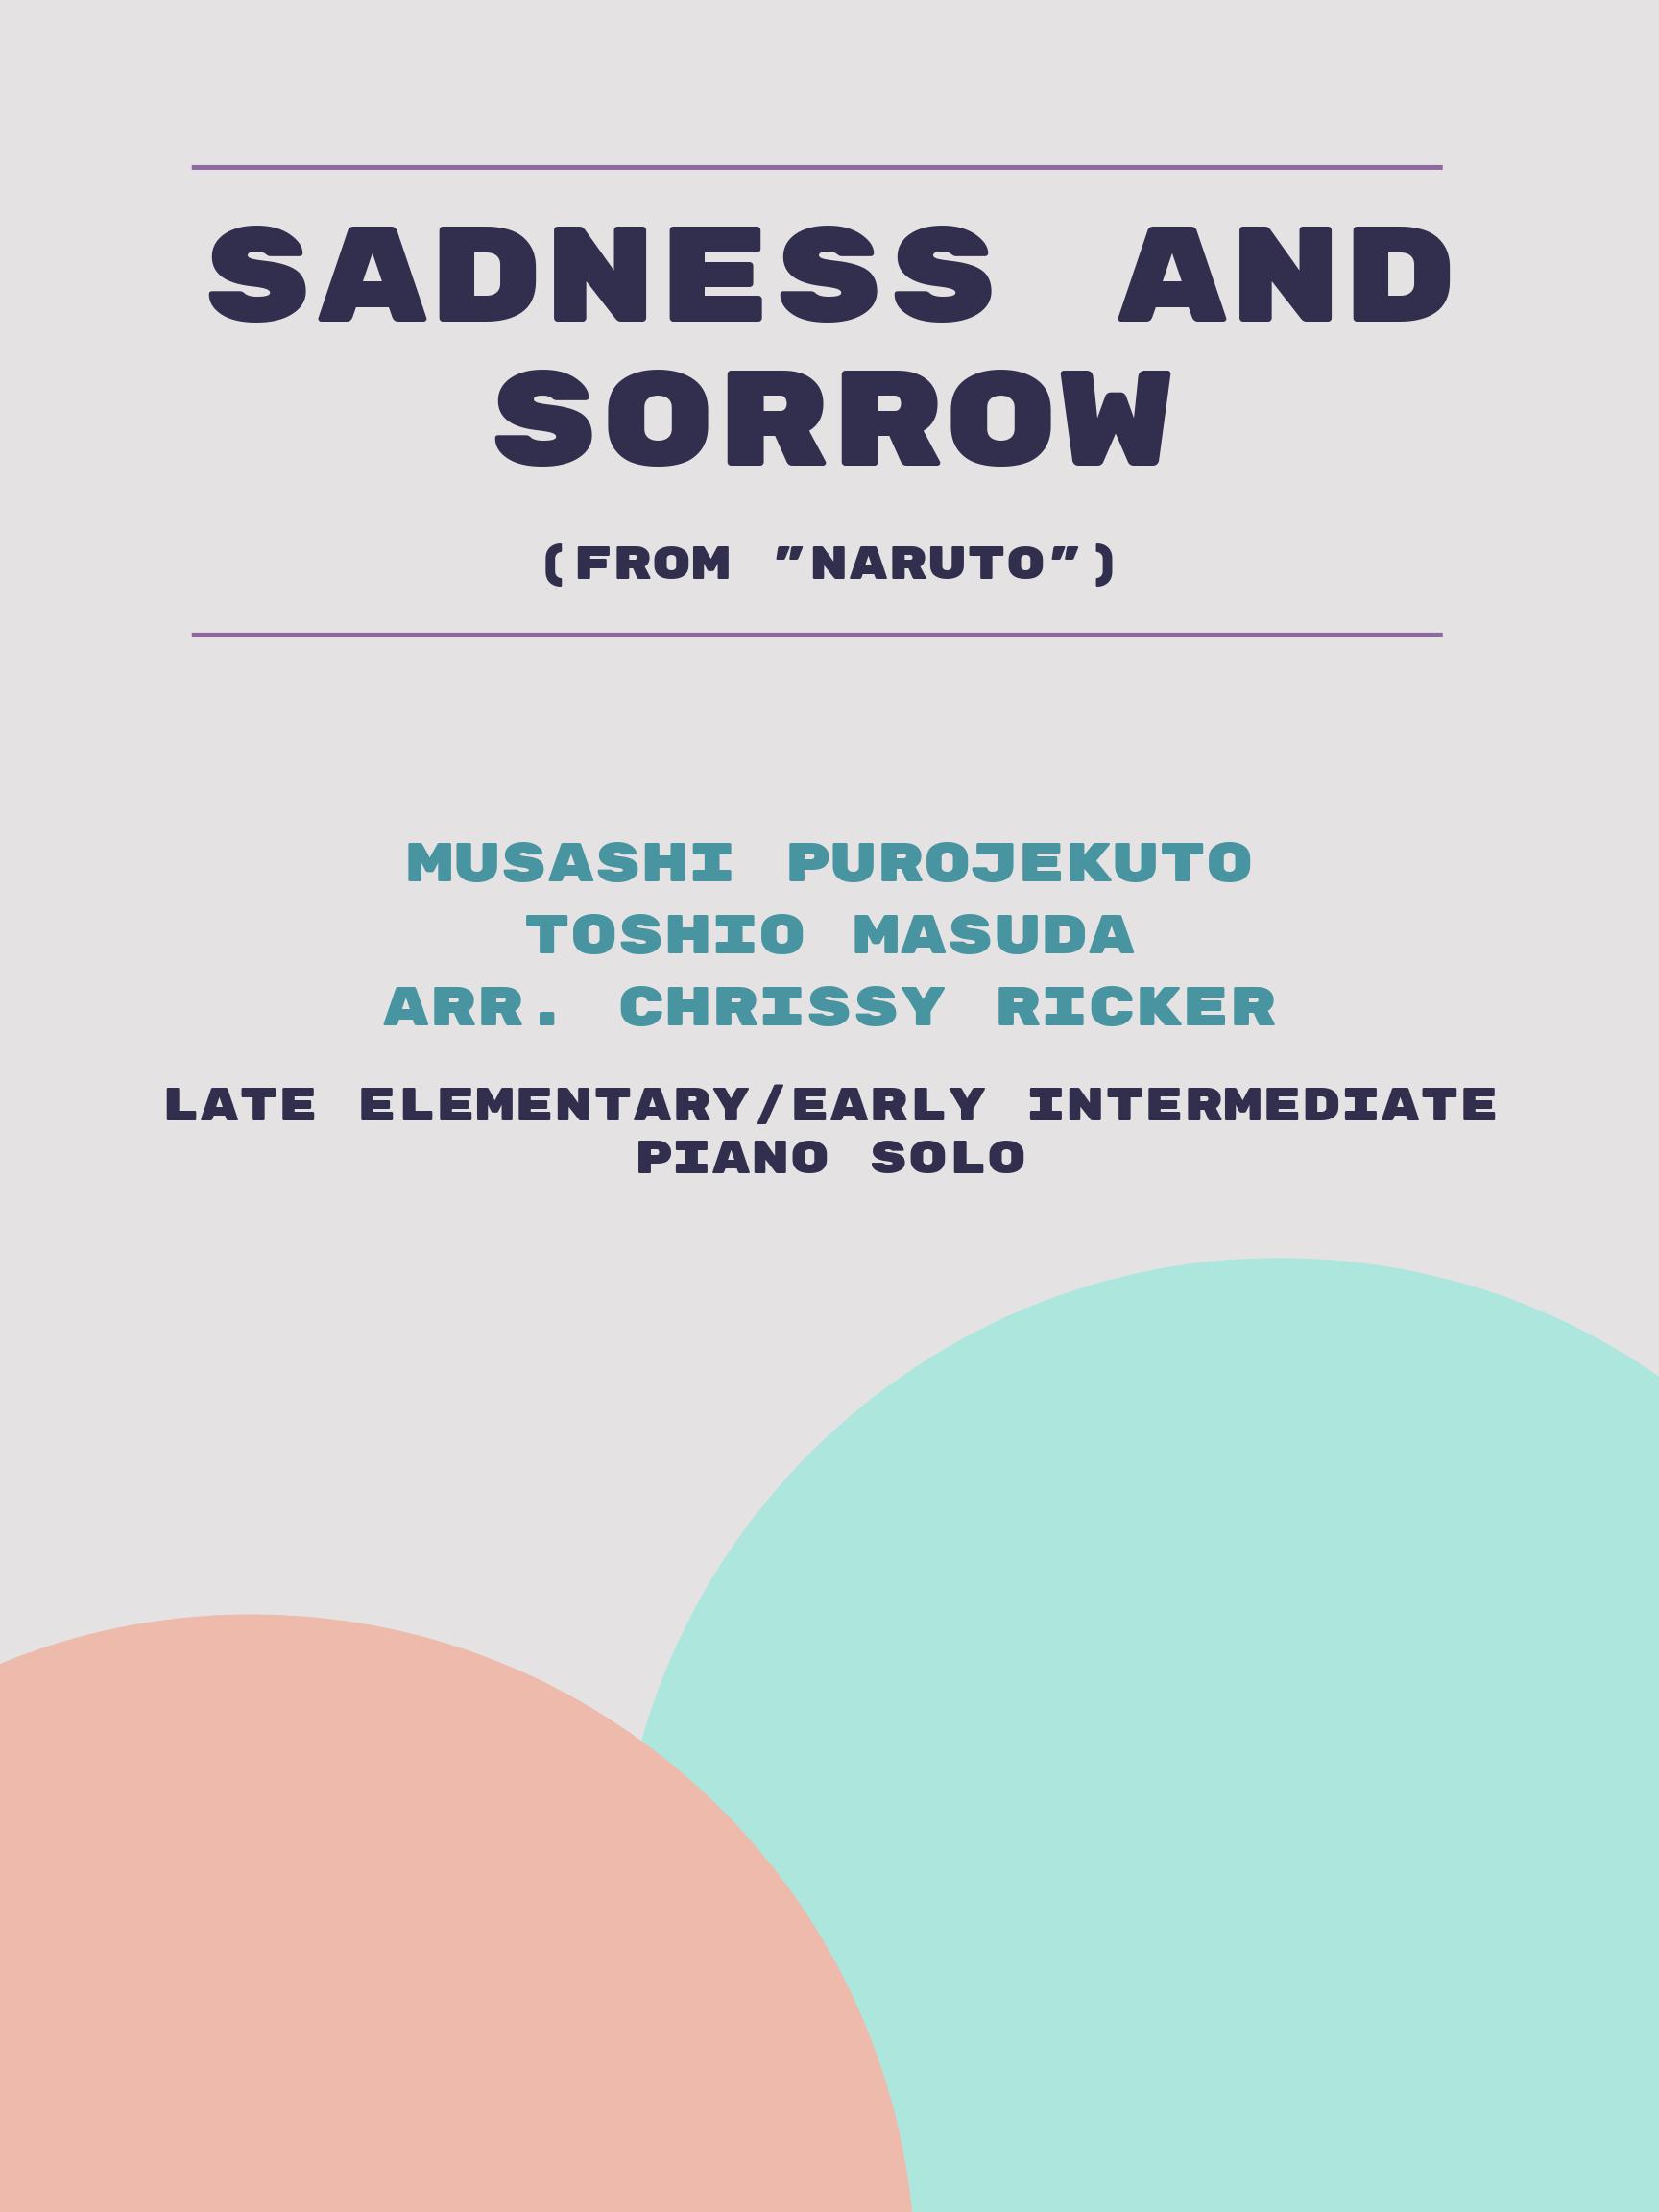 Sadness and Sorrow by Musashi Purojekuto, Toshio Masuda